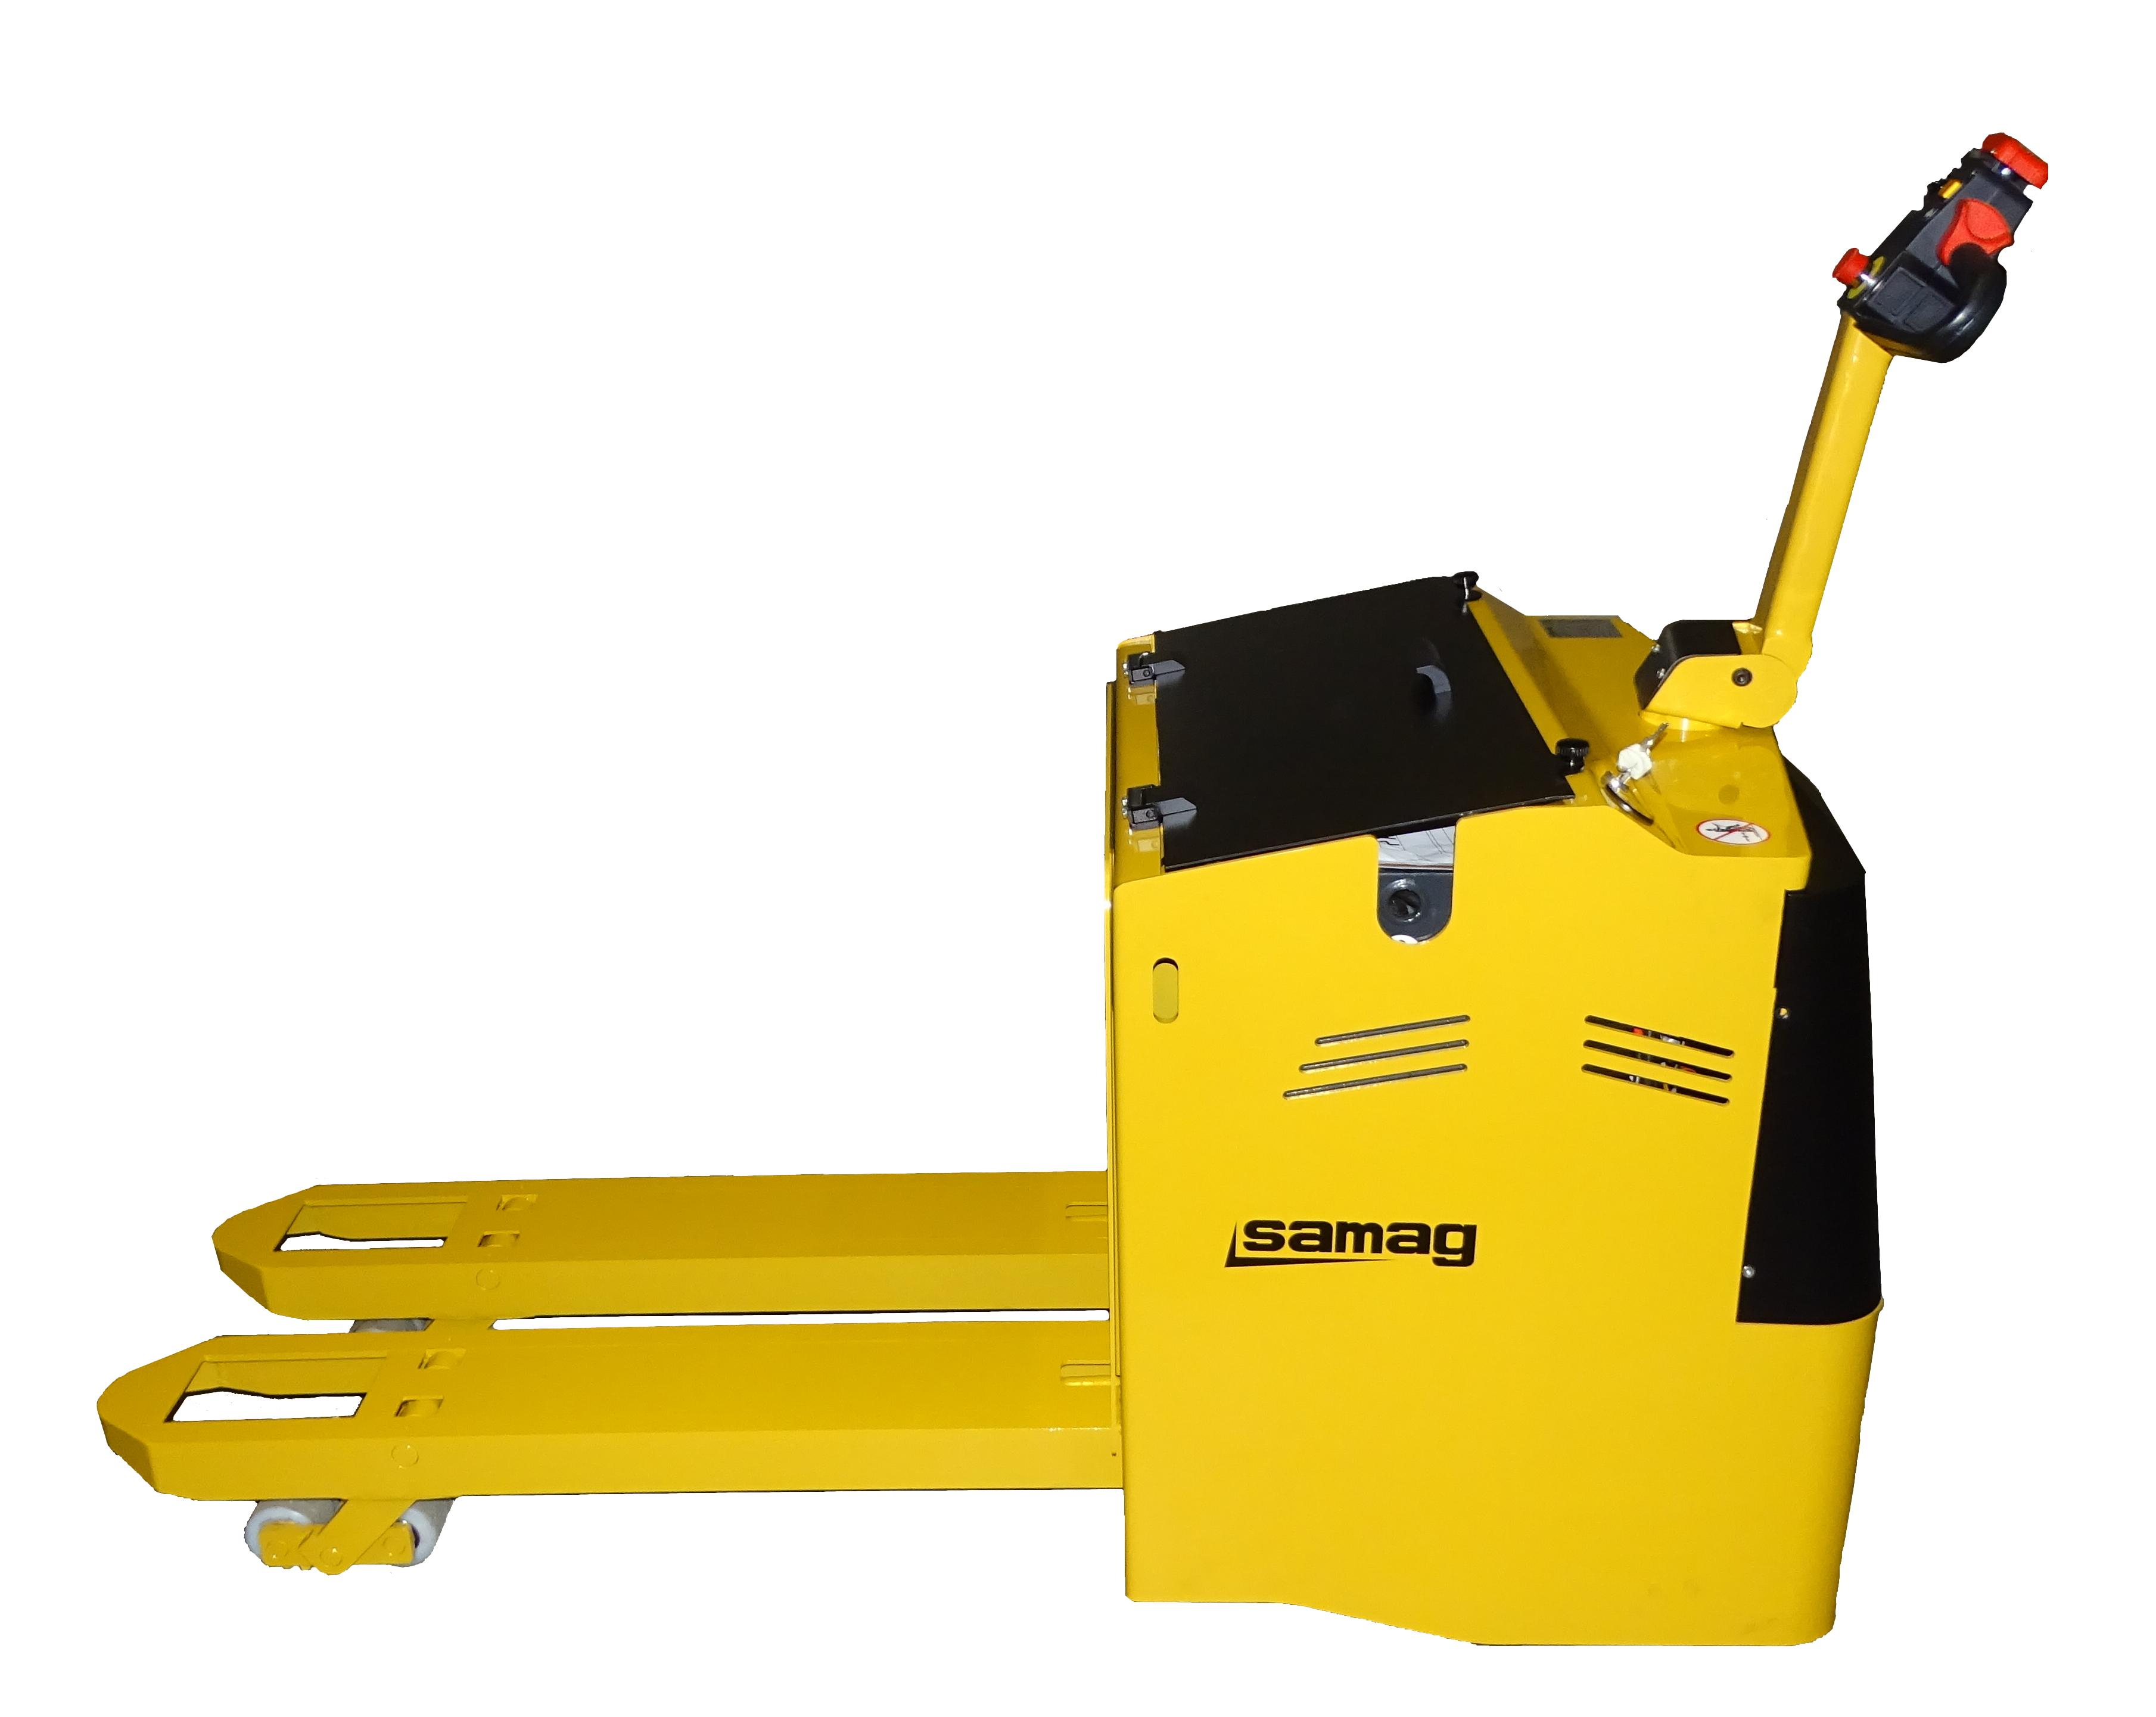 TMax 70-100 Samag